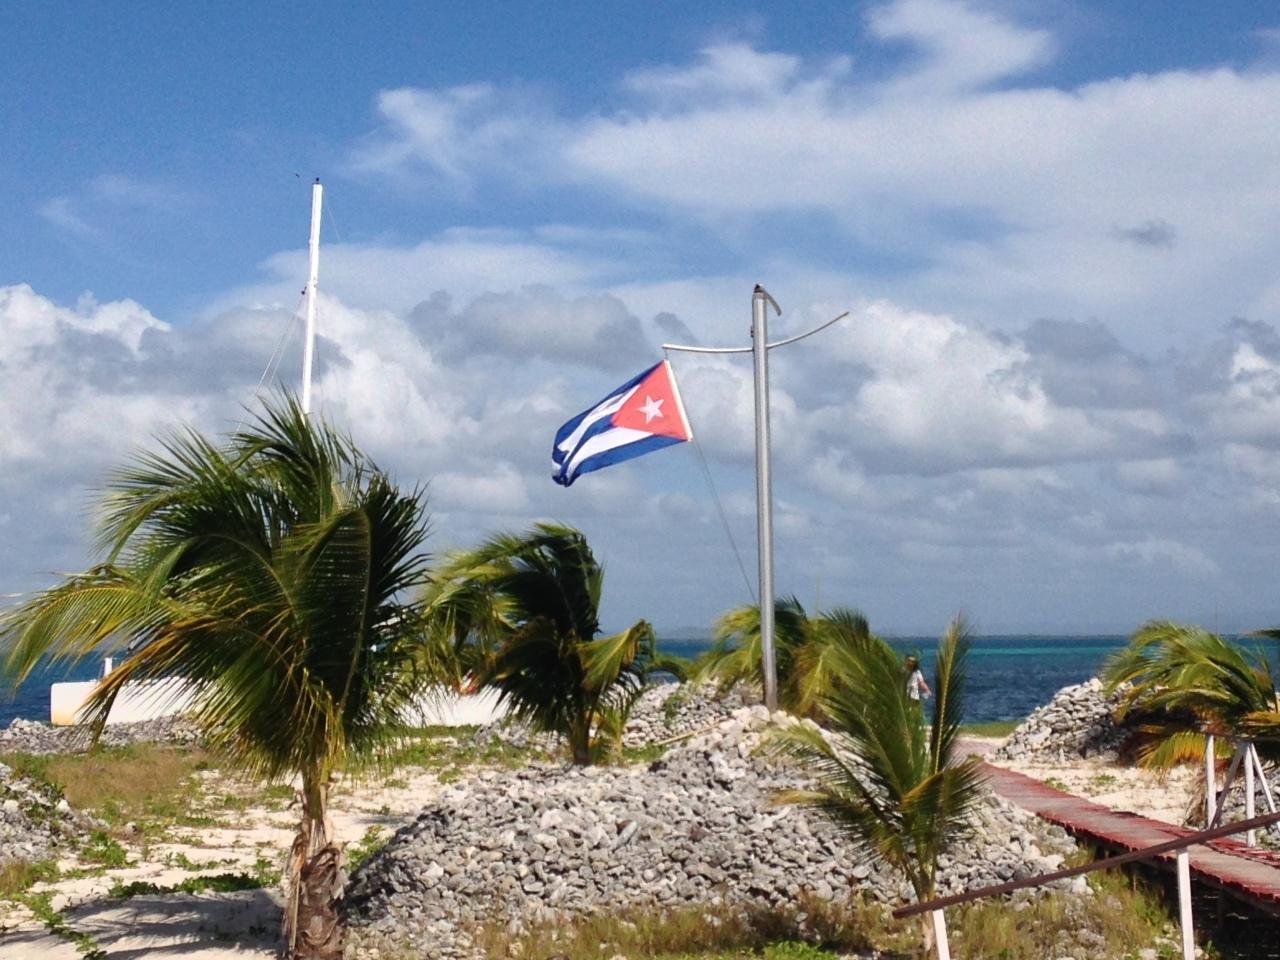 Cuba wrap up